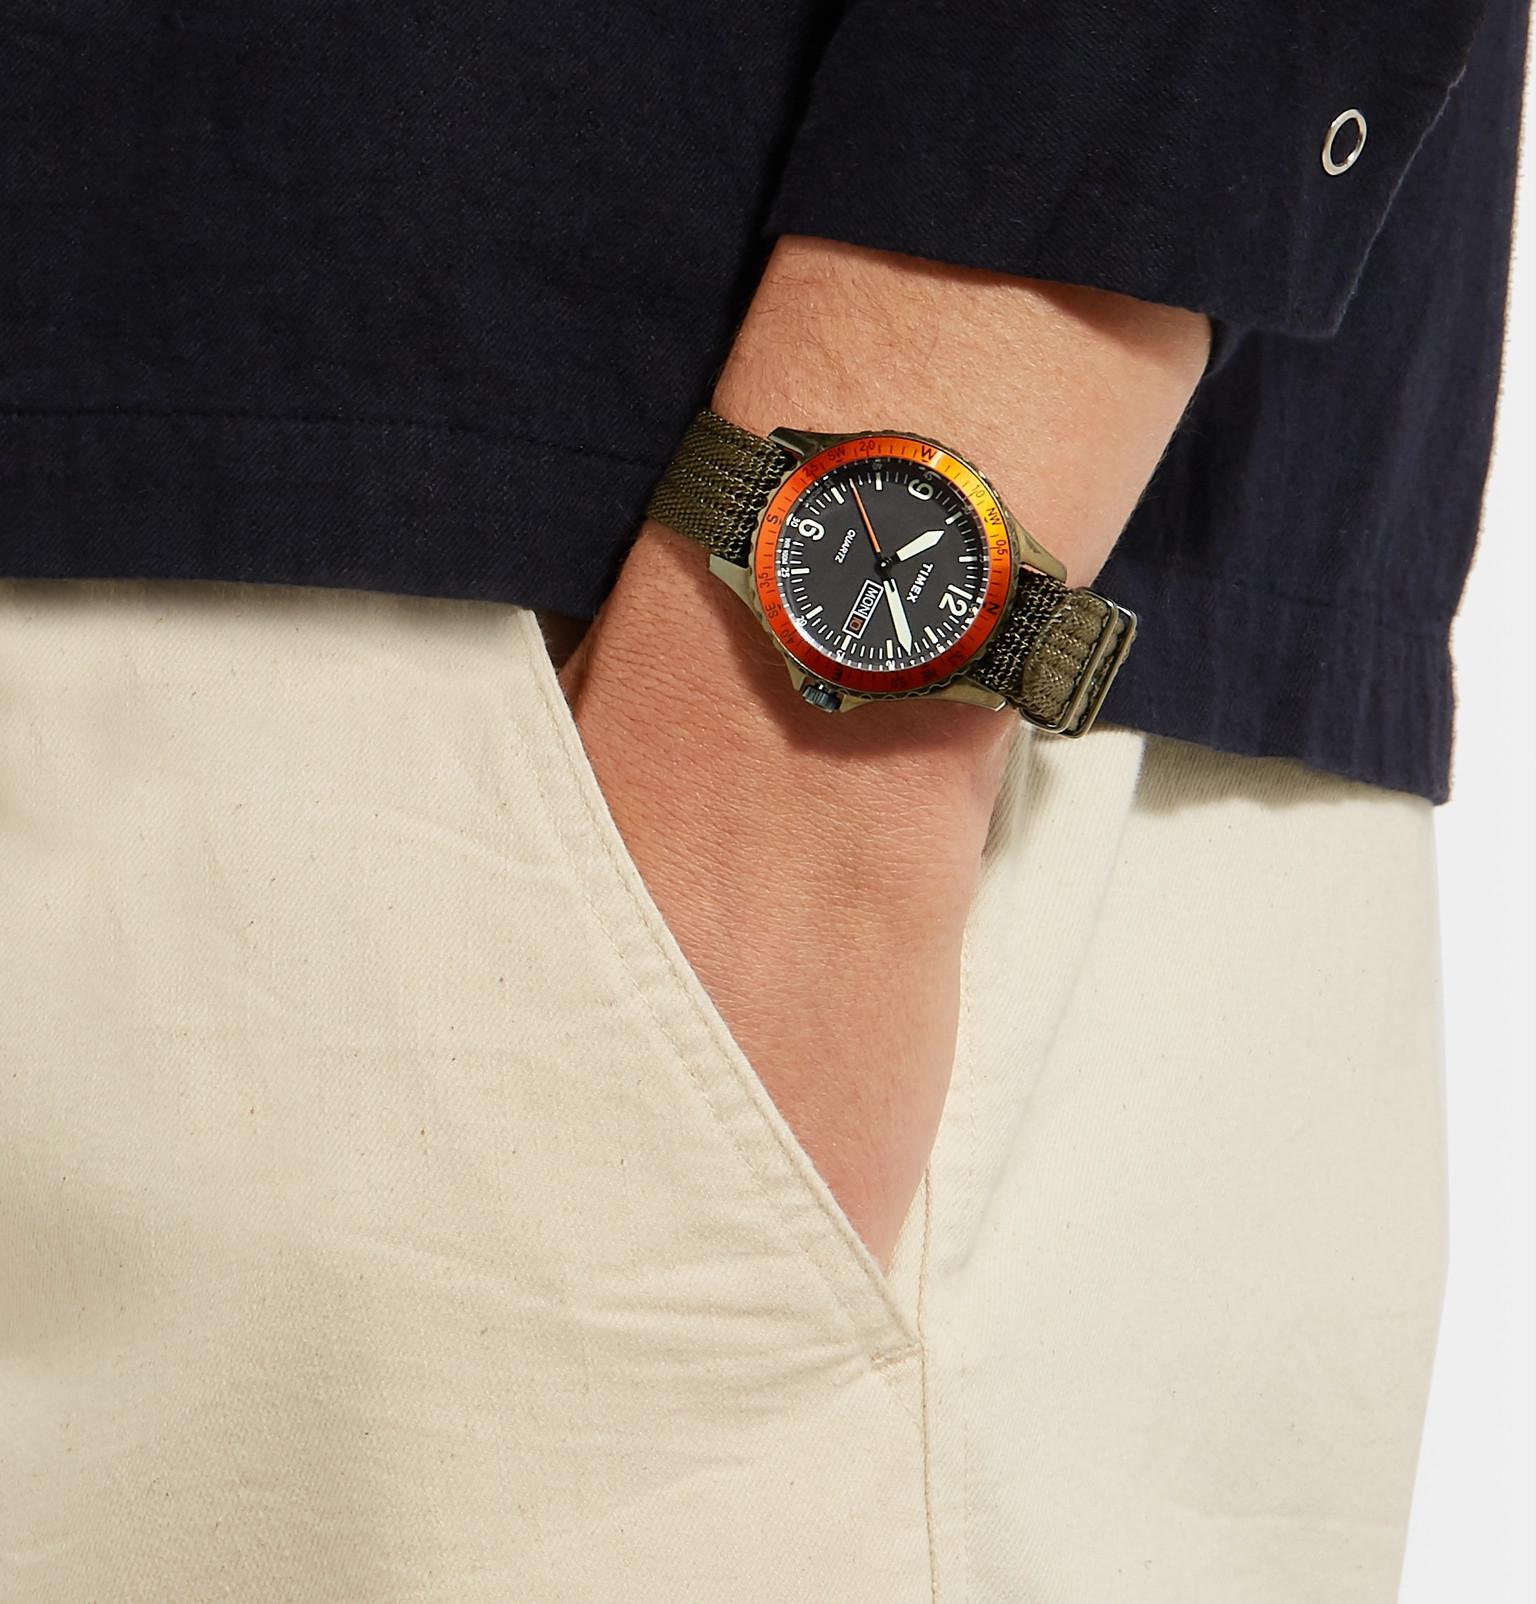 0da4f981abe Timex - Navi Land Stainless Steel and Nylon-Webbing Watch